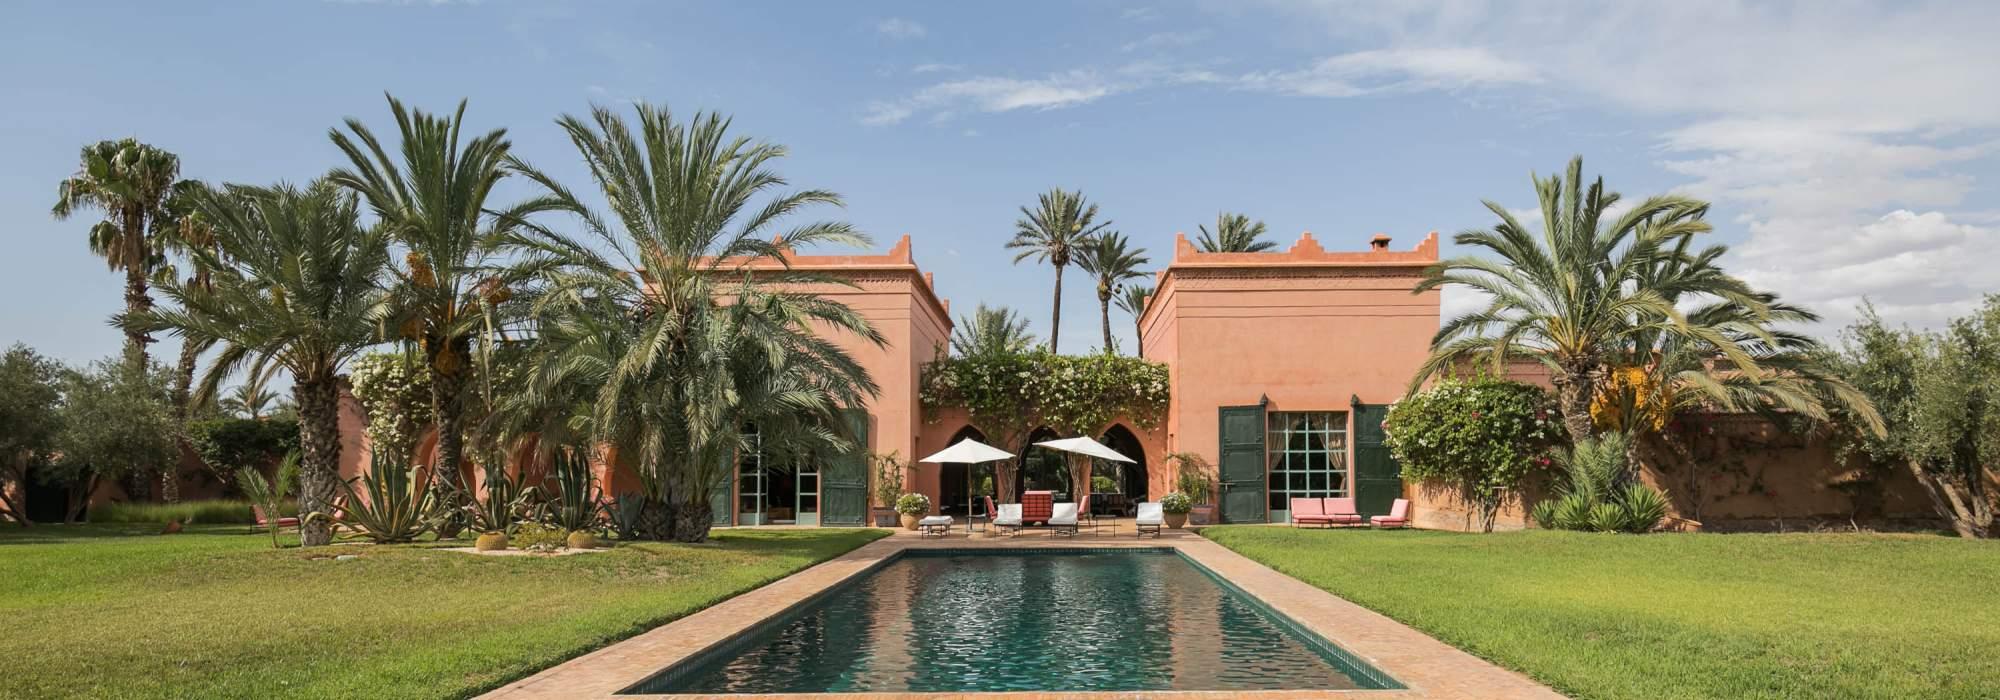 vente palais marocain palmeraie marrakech